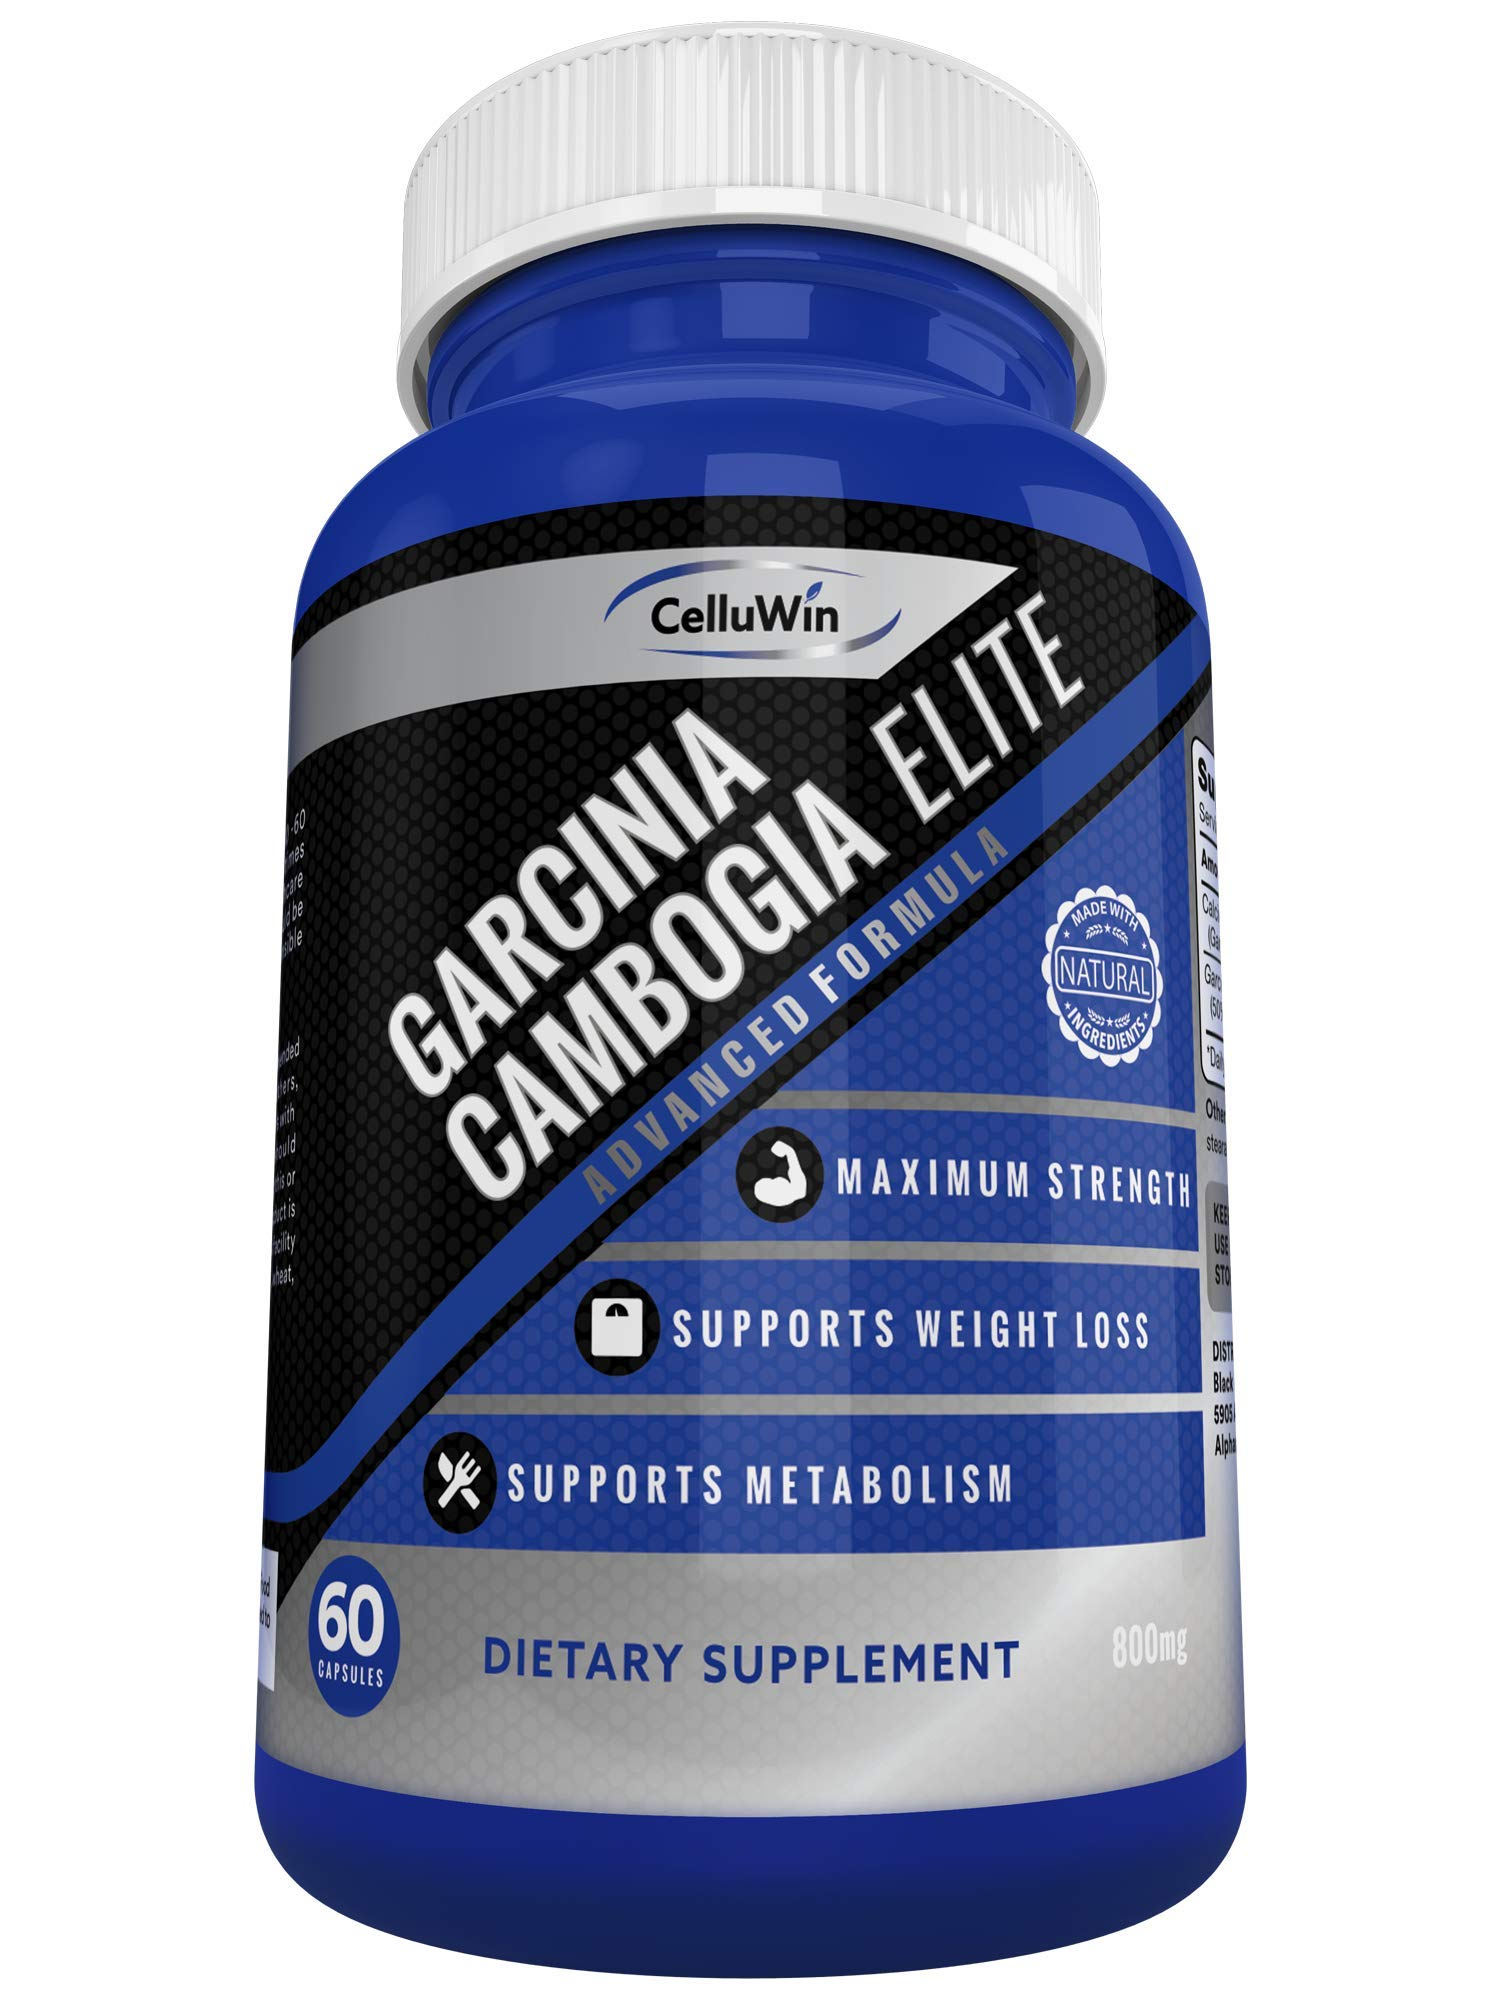 CelluWin Garcinia Cambogia ** 100% Pure Garcinia